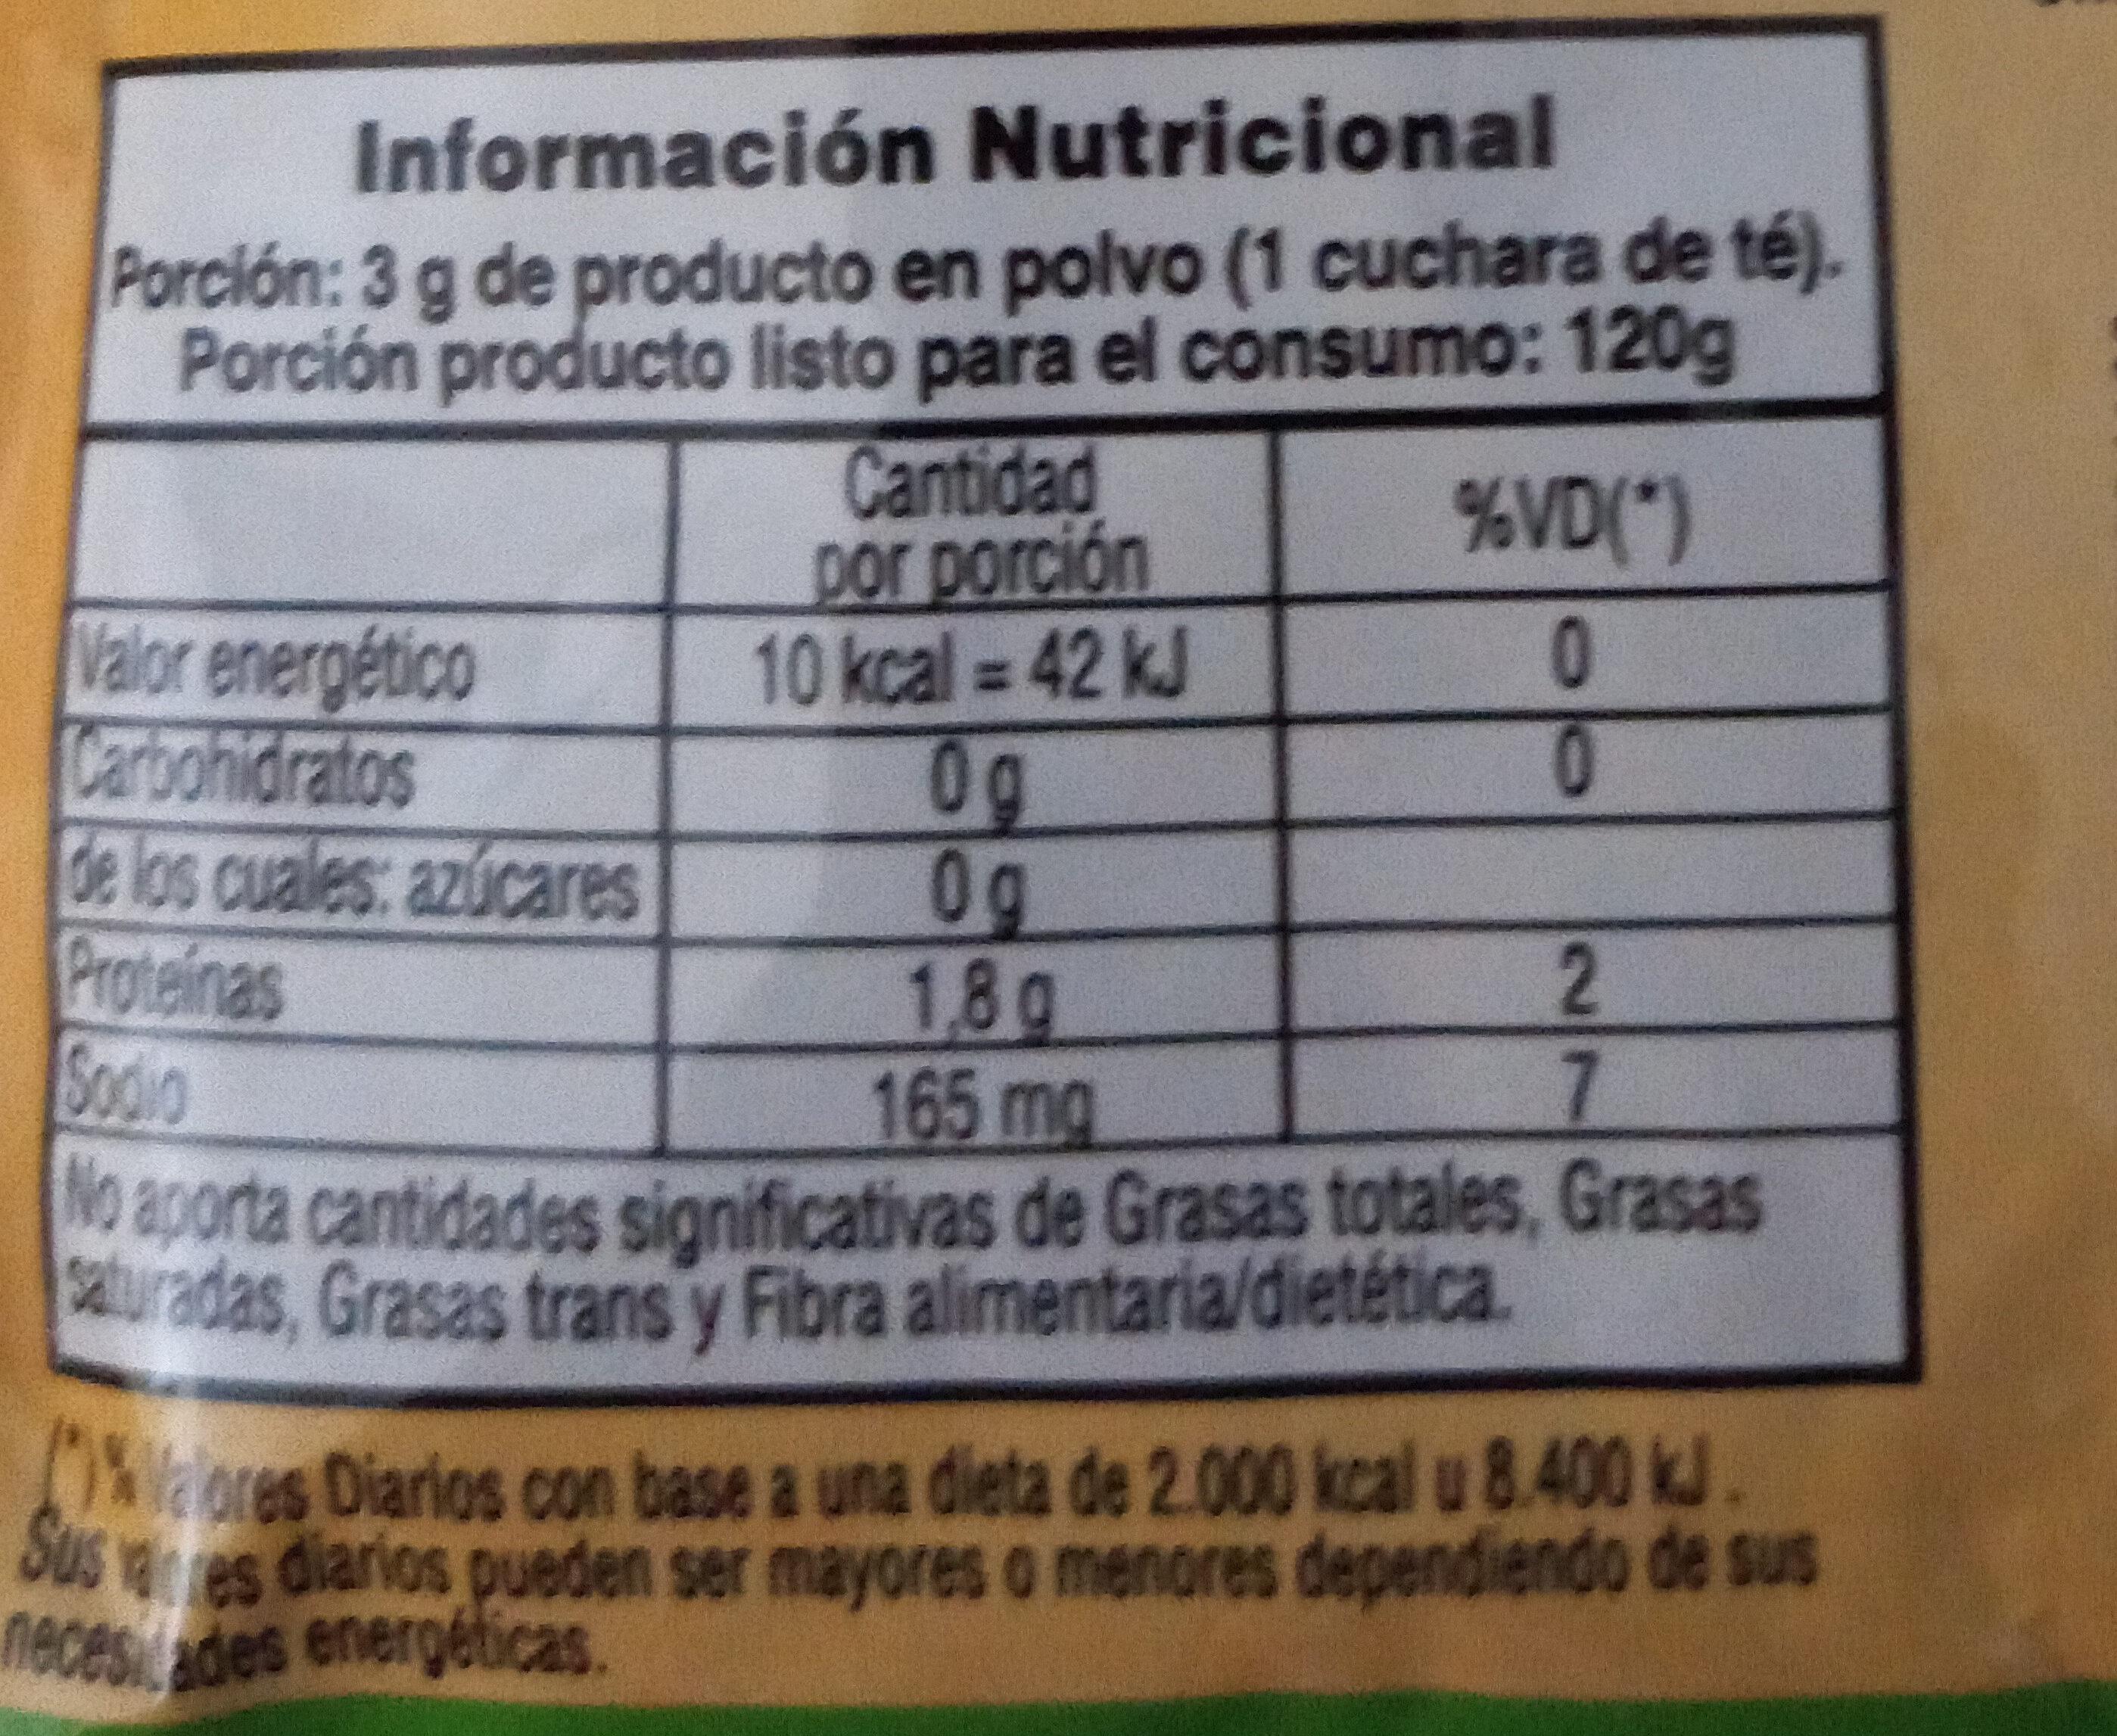 Gelatina Sabor Durazno Sin Azucar - Informations nutritionnelles - es